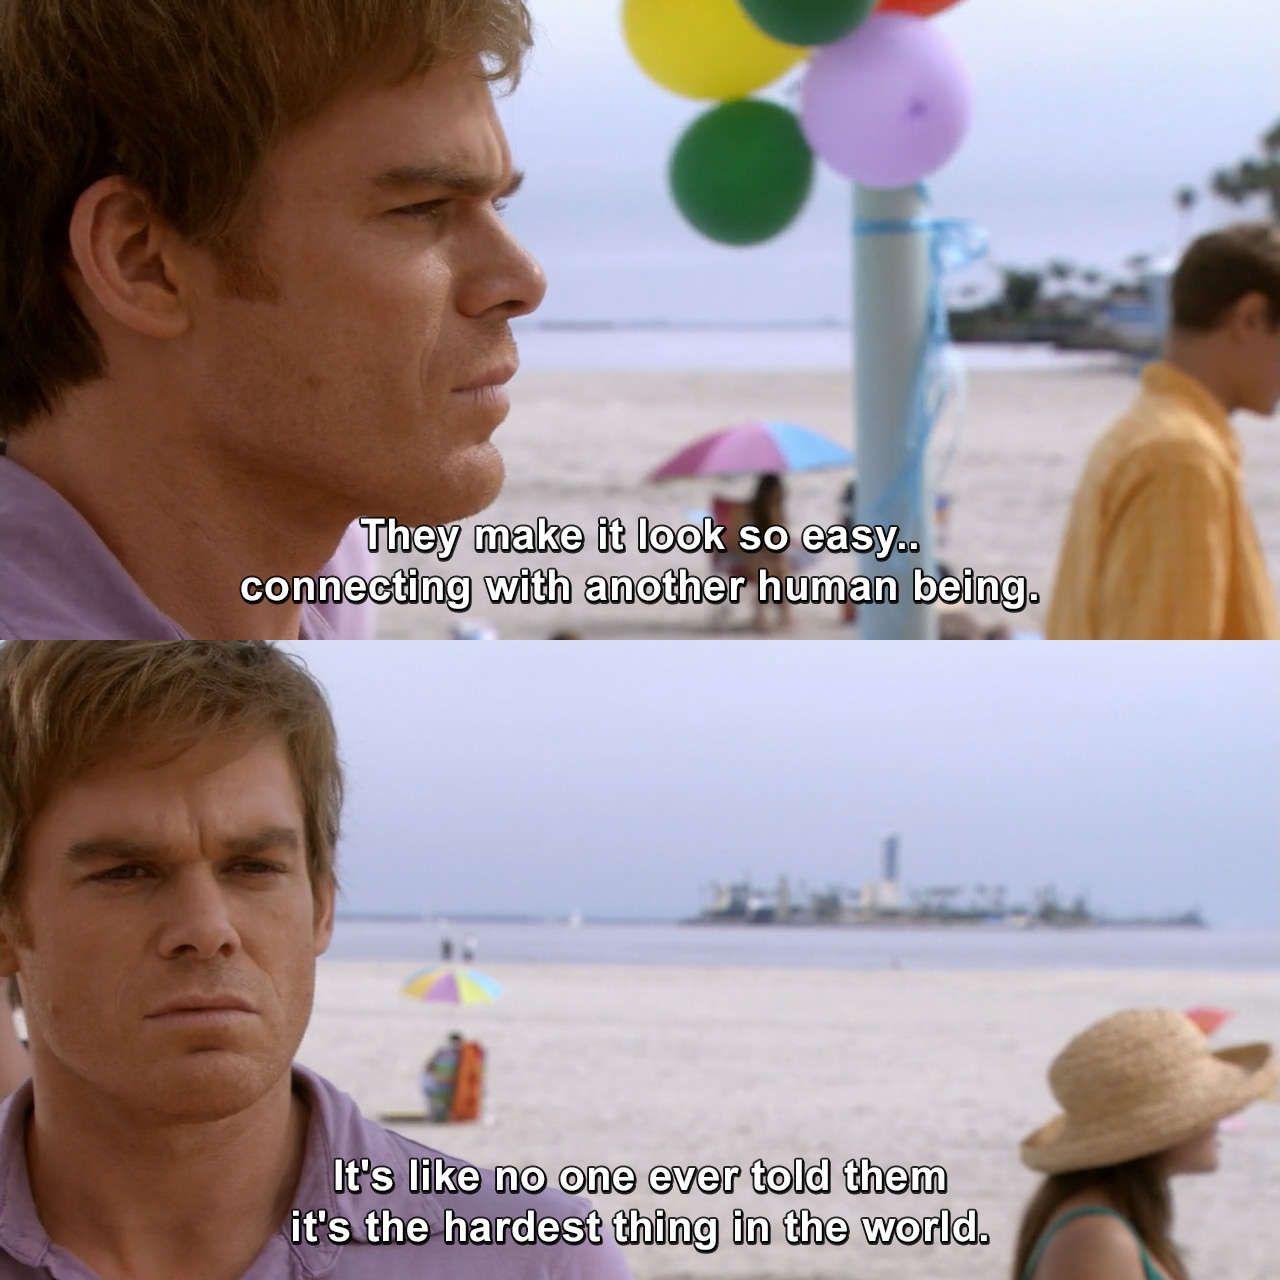 Dexter Those Kinds Of Things Dextermorgan Dexter Thosekindsofthings Humor Lol Dexter Funny Dexter Quotes Dexter Morgan